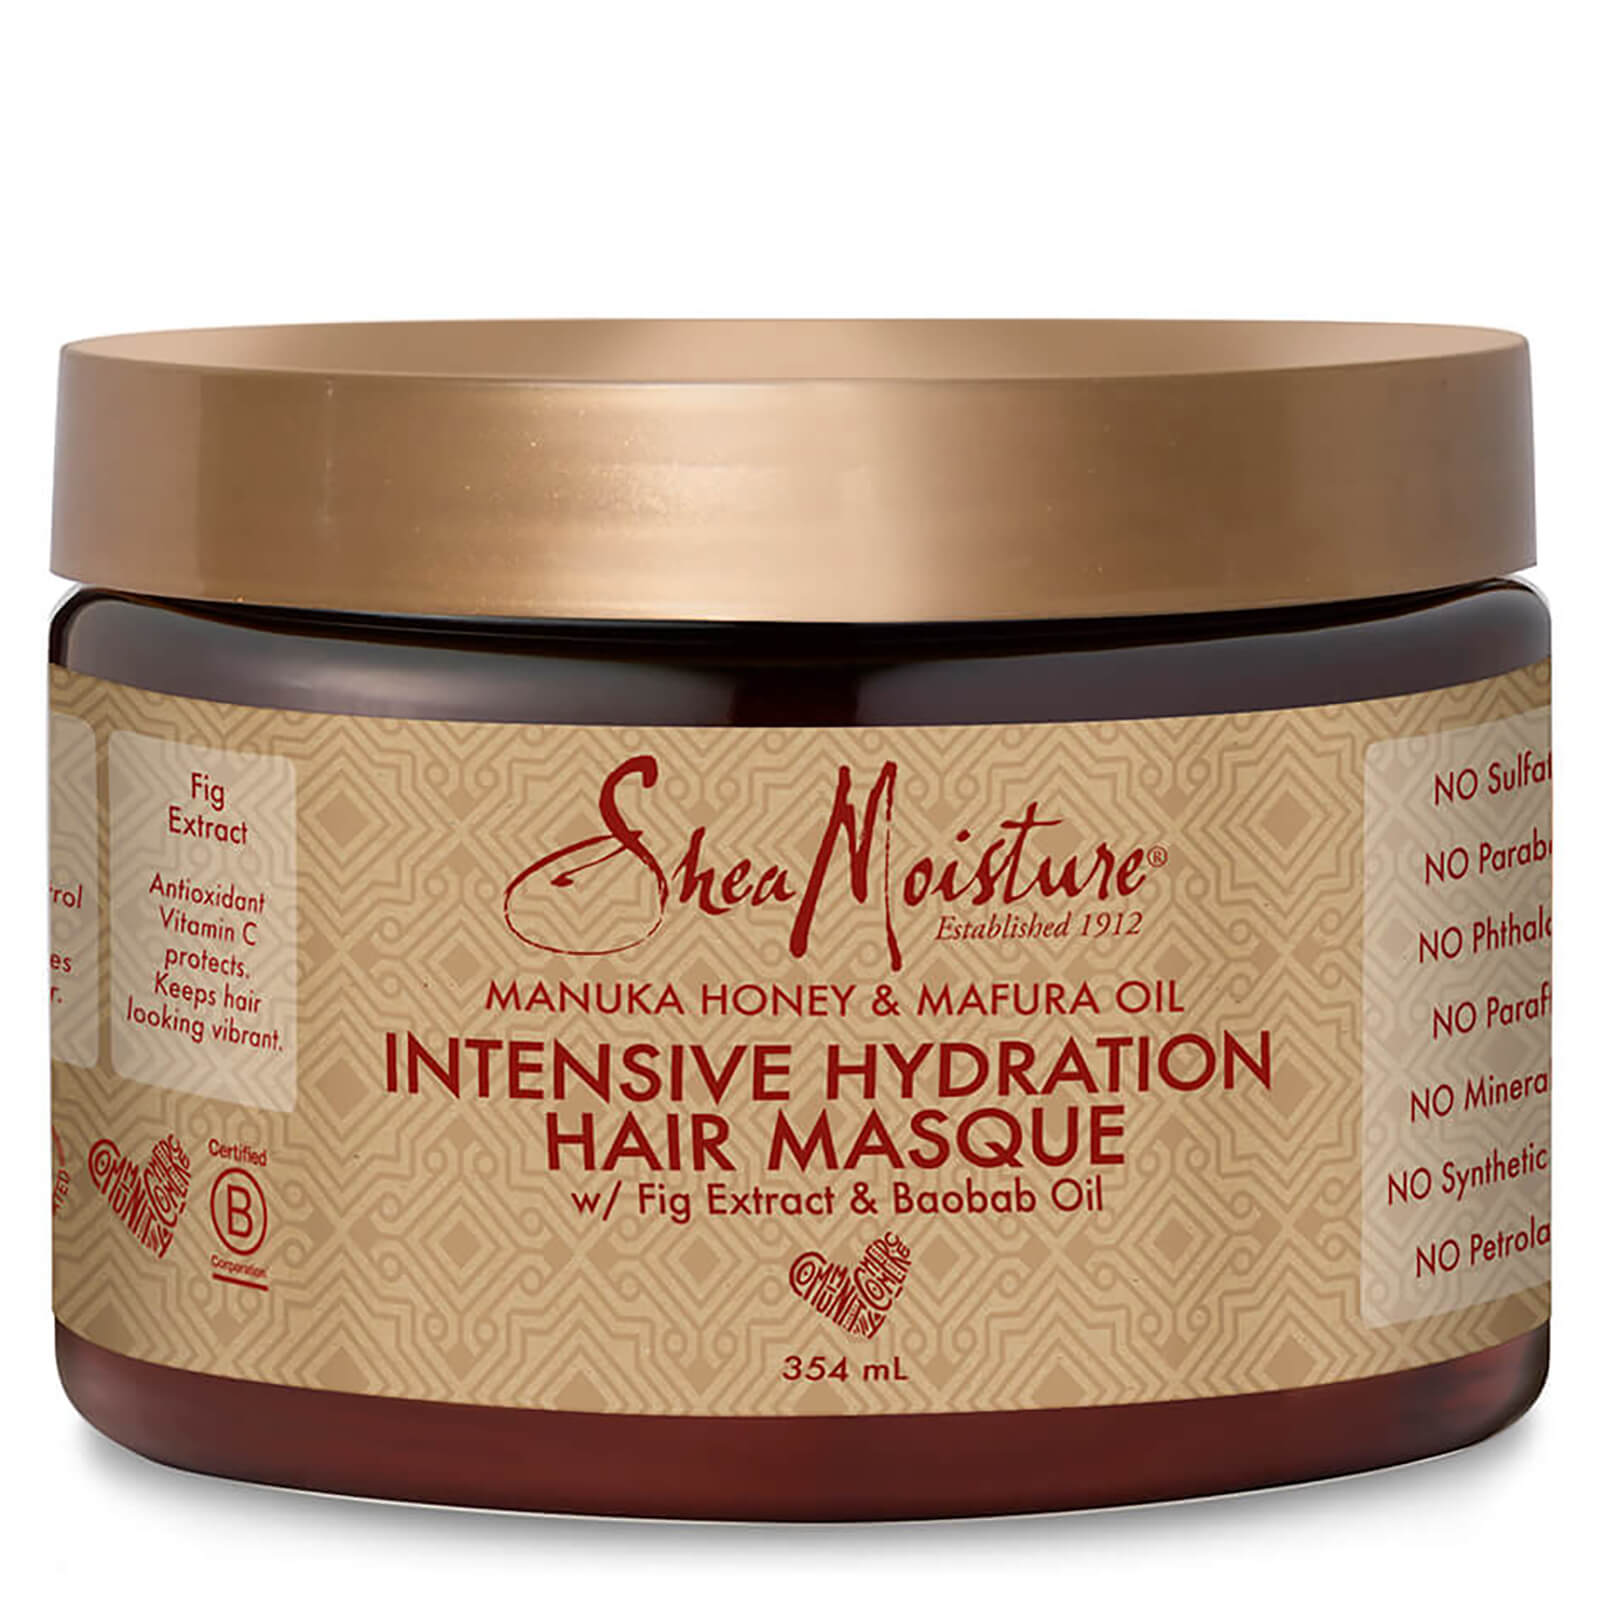 shea moisture manuka honey & mafura oil intensive hydration hair masque 354ml